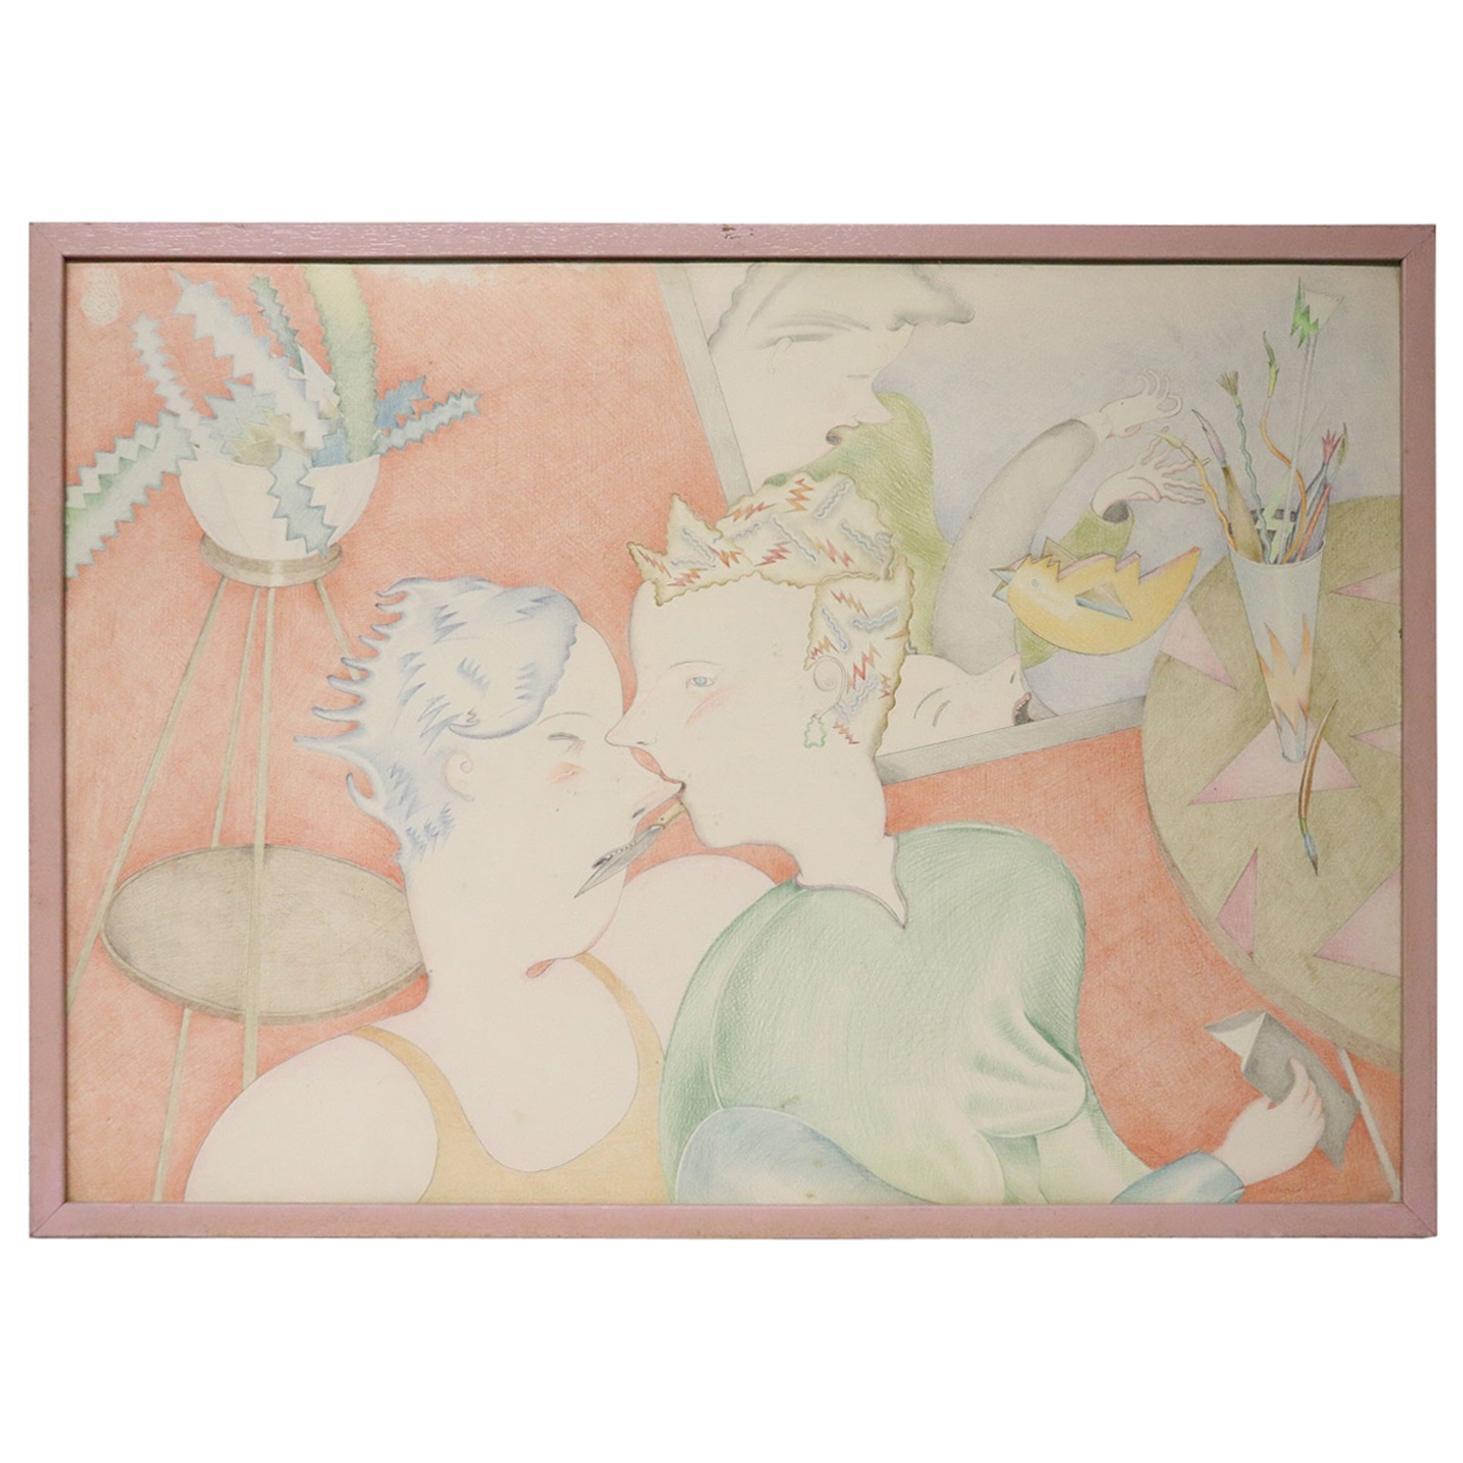 20th Century Important Italian Artist Crayons on Paper by Luca Alinari